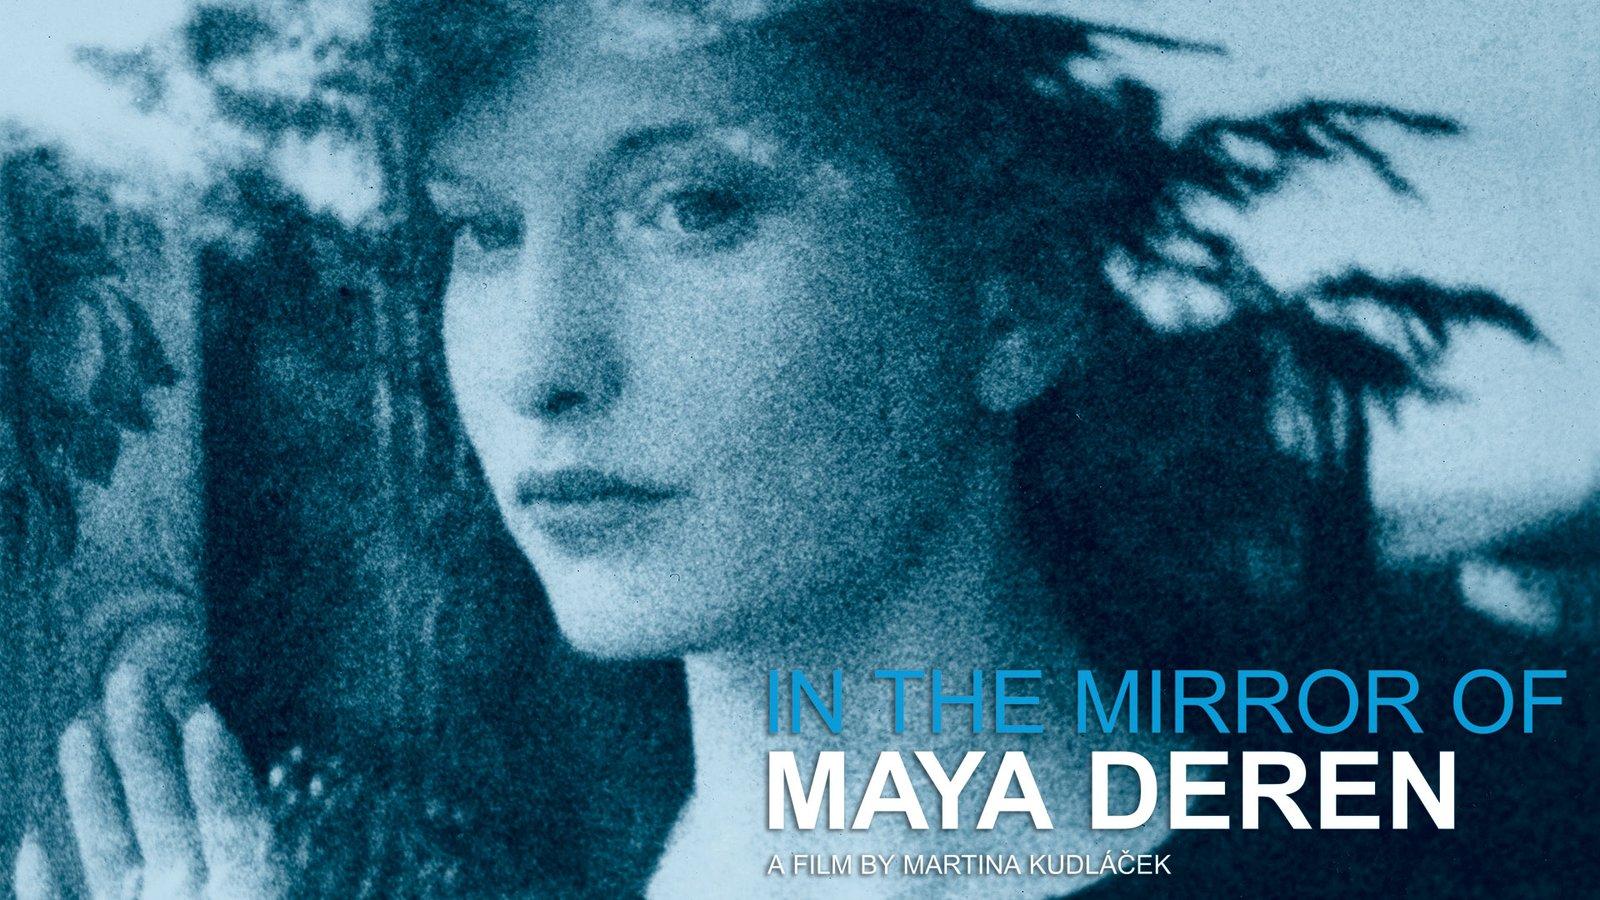 In The Mirror of Maya Deren - An Innovative Avant-Garde Filmmaker